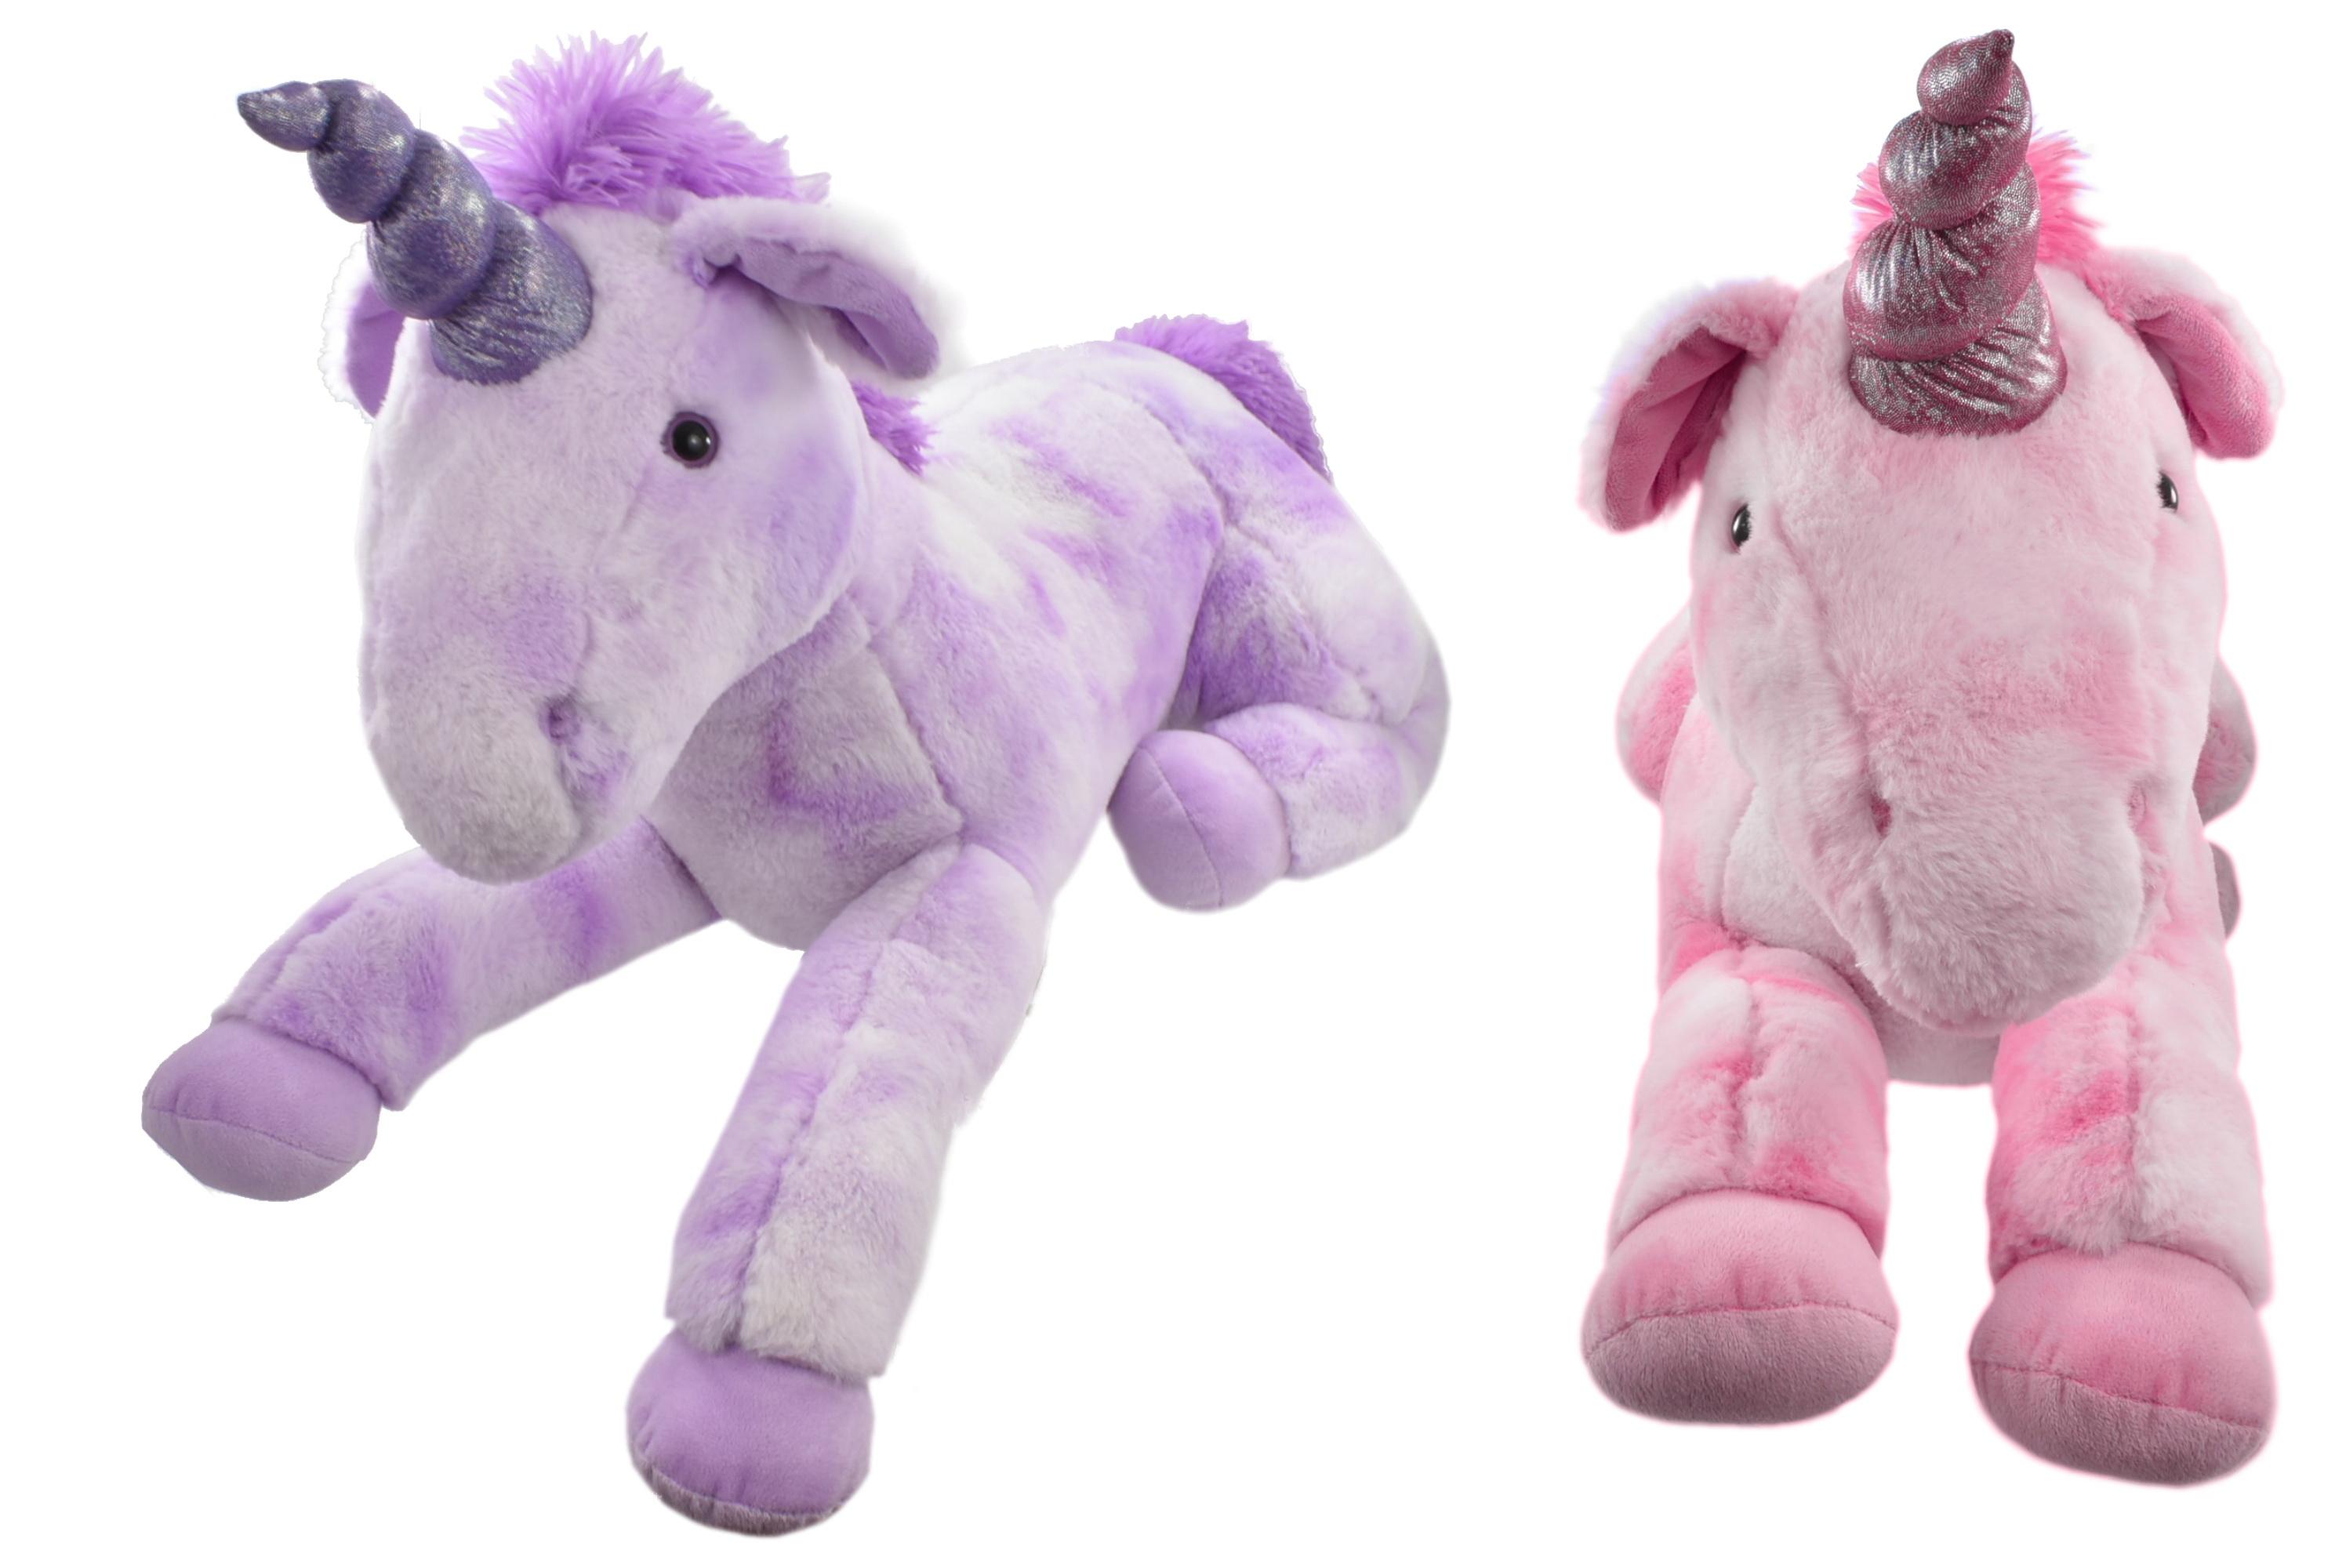 80cm Plush Lying Down Unicorns - 2 Assorted Colours